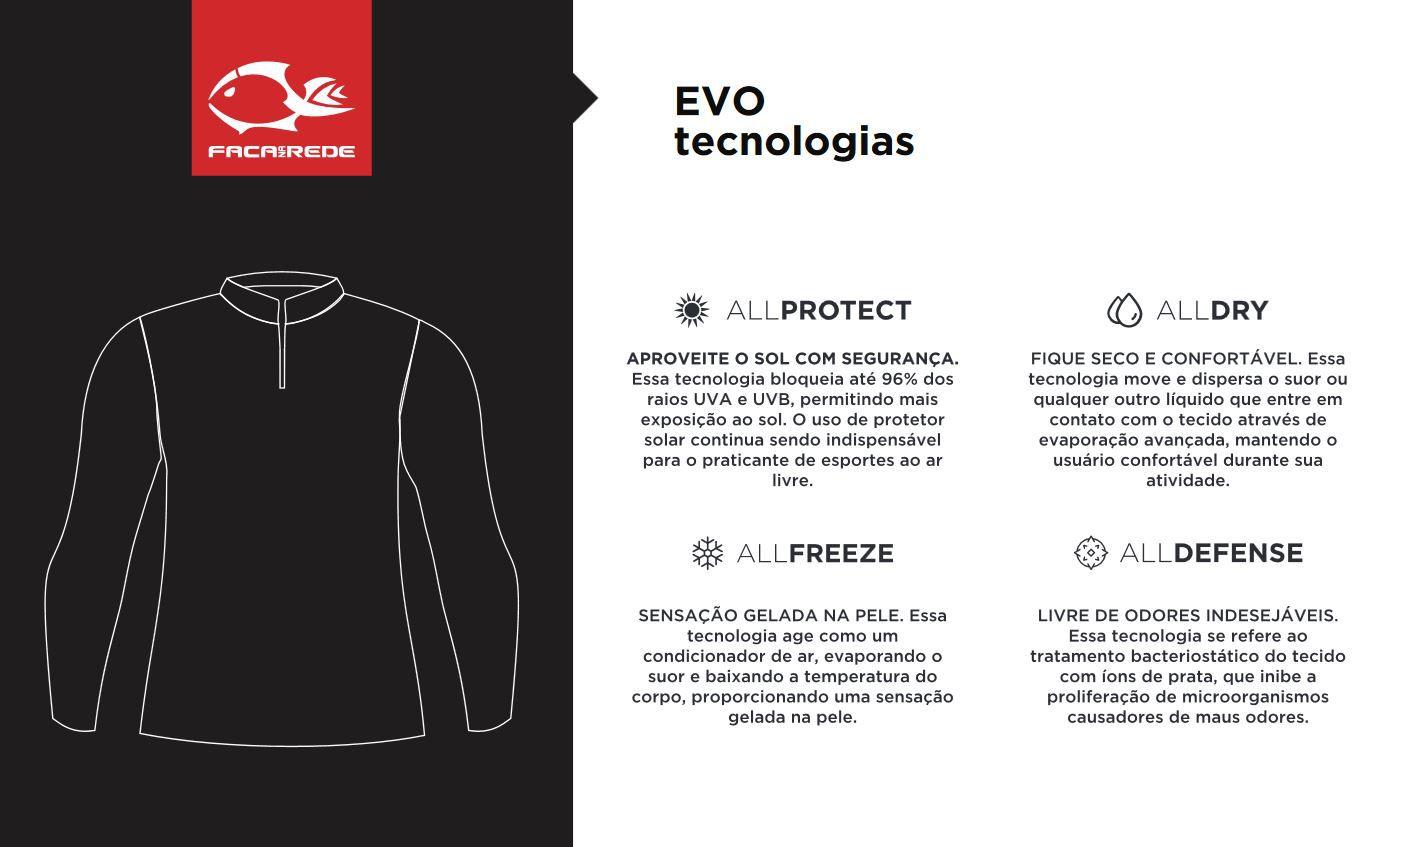 Camiseta de Pesca Feminina Faca na Rede EVO Girl + Bandana TB19  - Life Pesca - Sua loja de Pesca, Camping e Lazer